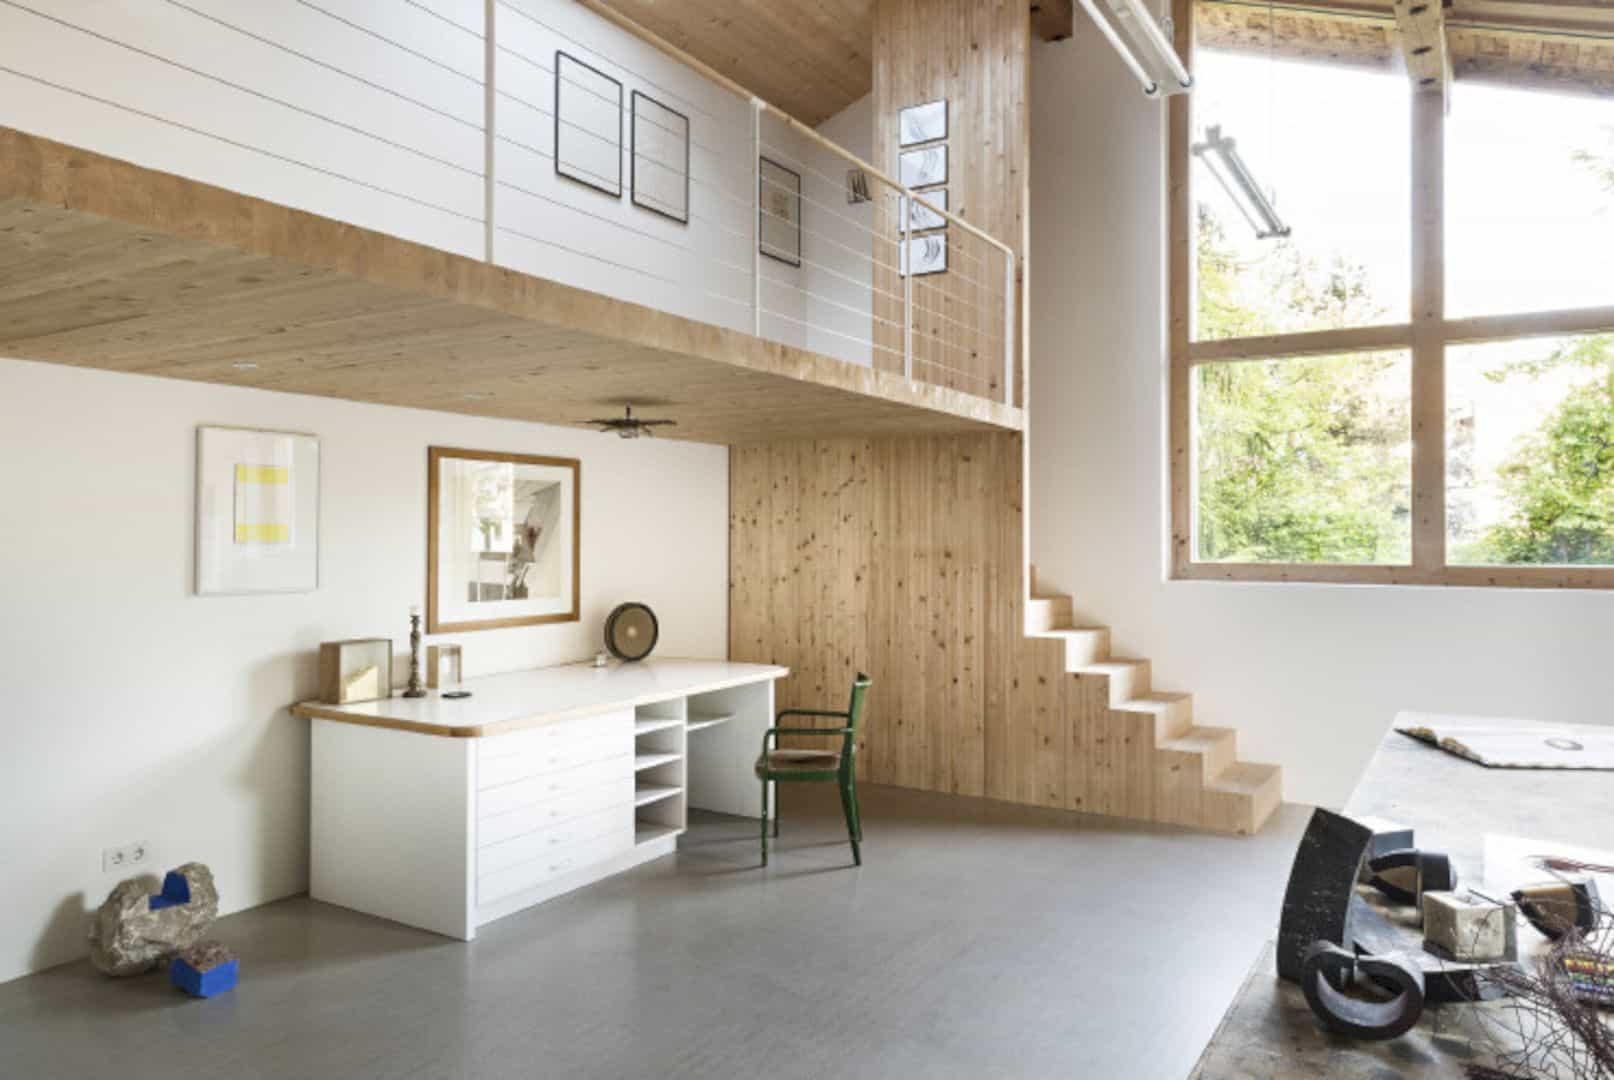 Studio Franz Messner Renovation 4